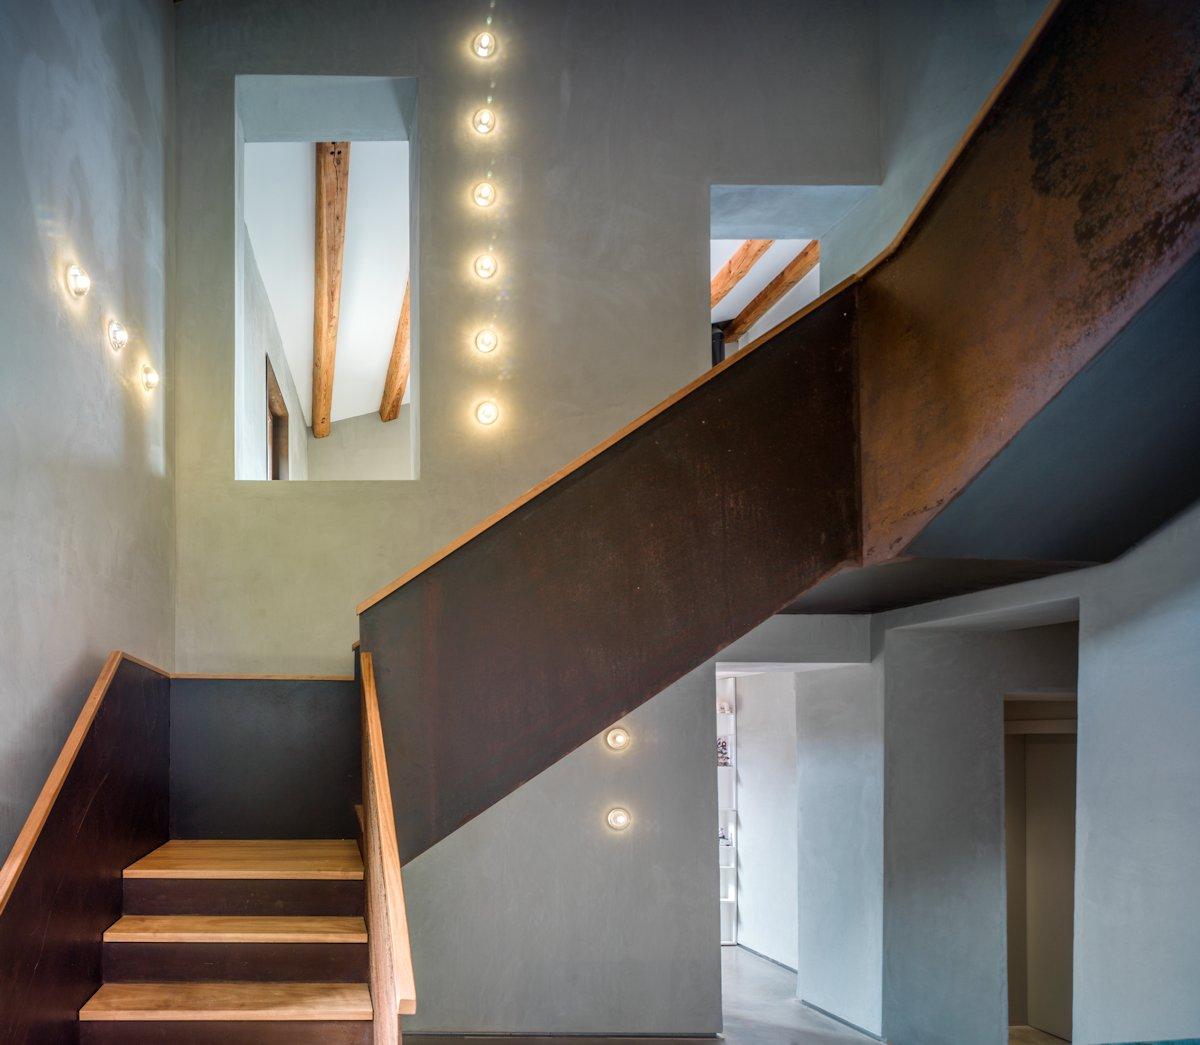 Wood & Metal Stairs, Lighting, Catalan Farmhouse, Girona, Spain